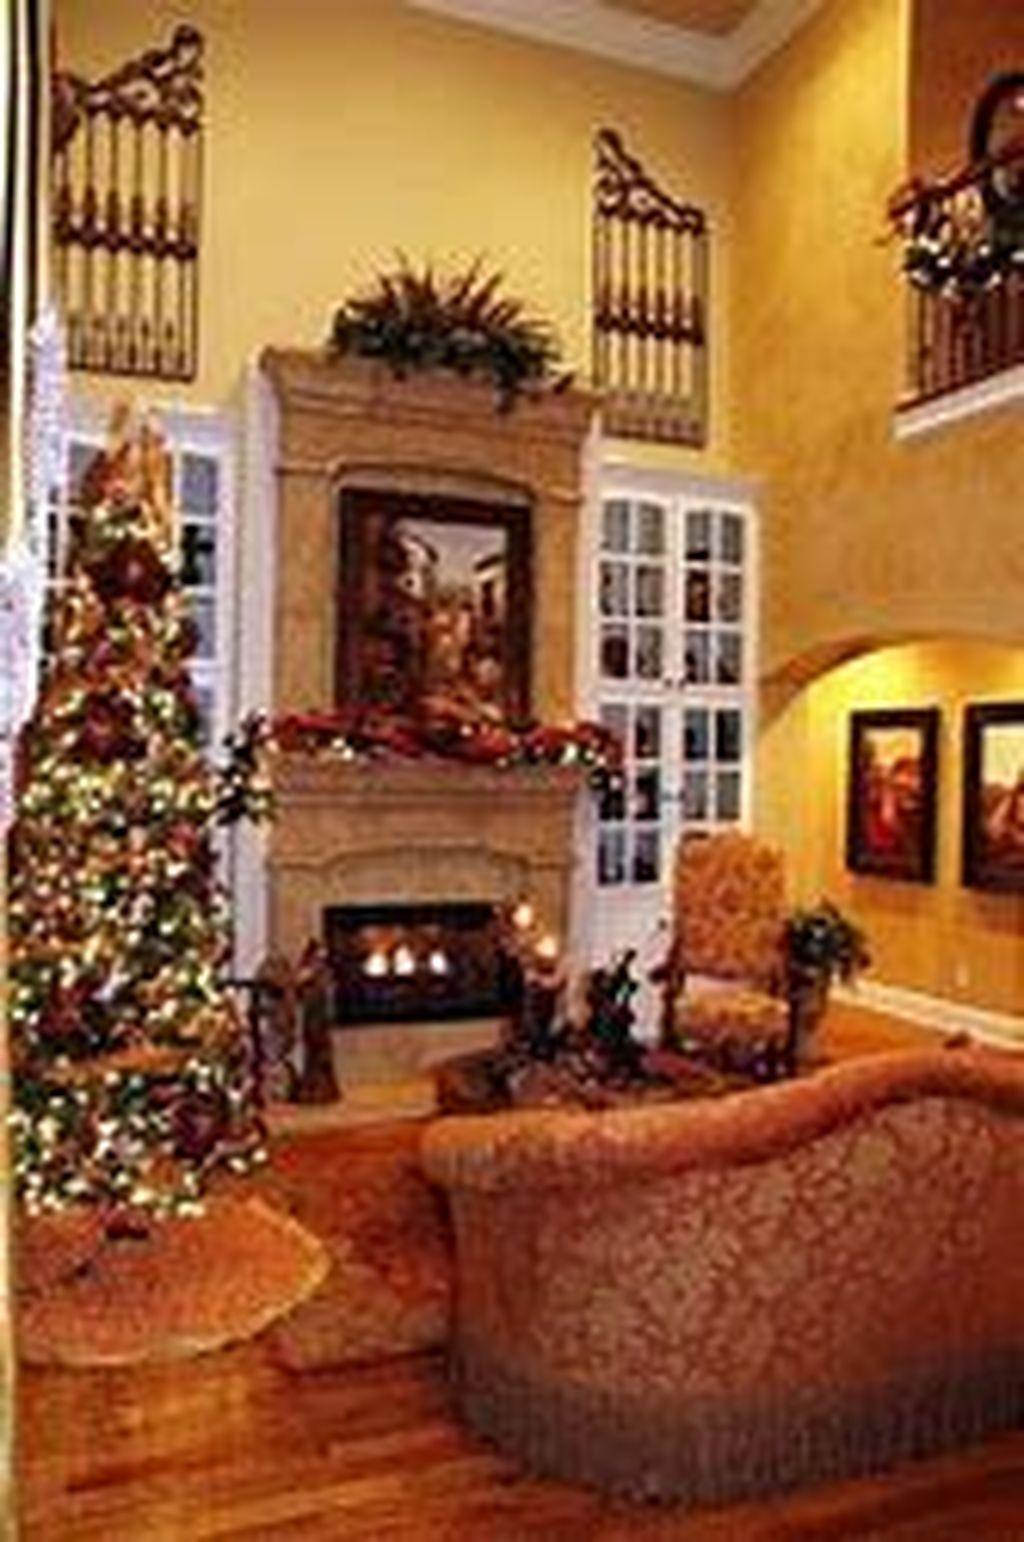 46 Easy Tuscan Design Ideas For Living Room Tuscan Living Rooms Tuscan Decorating Tuscan Design #tuscan #living #room #decorating #ideas